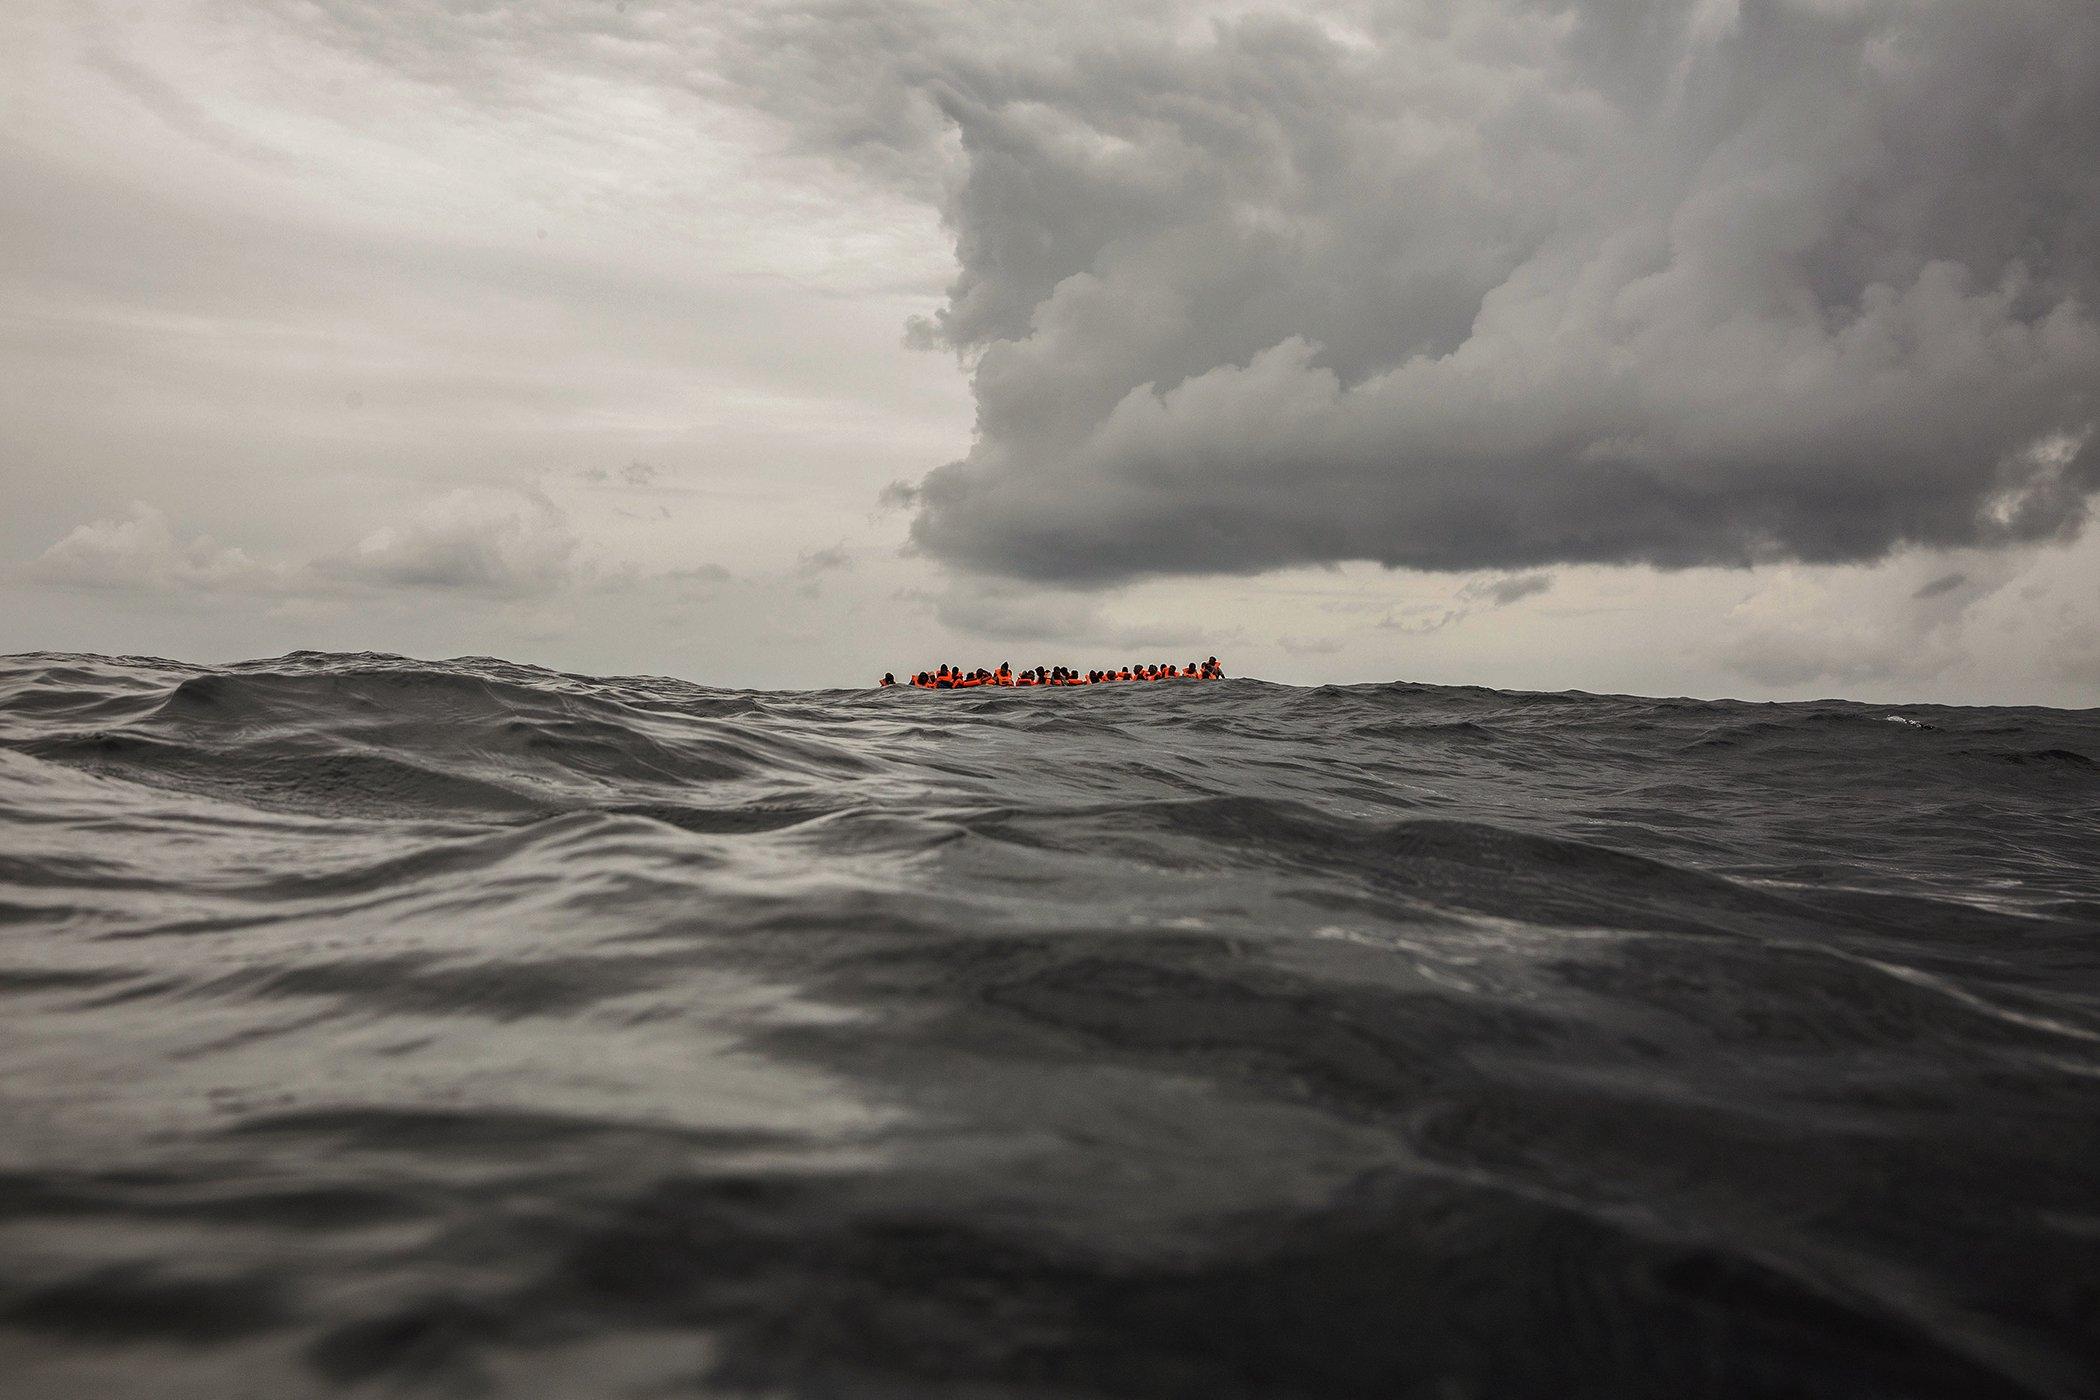 Libya-Migrants-Refugees.jpg